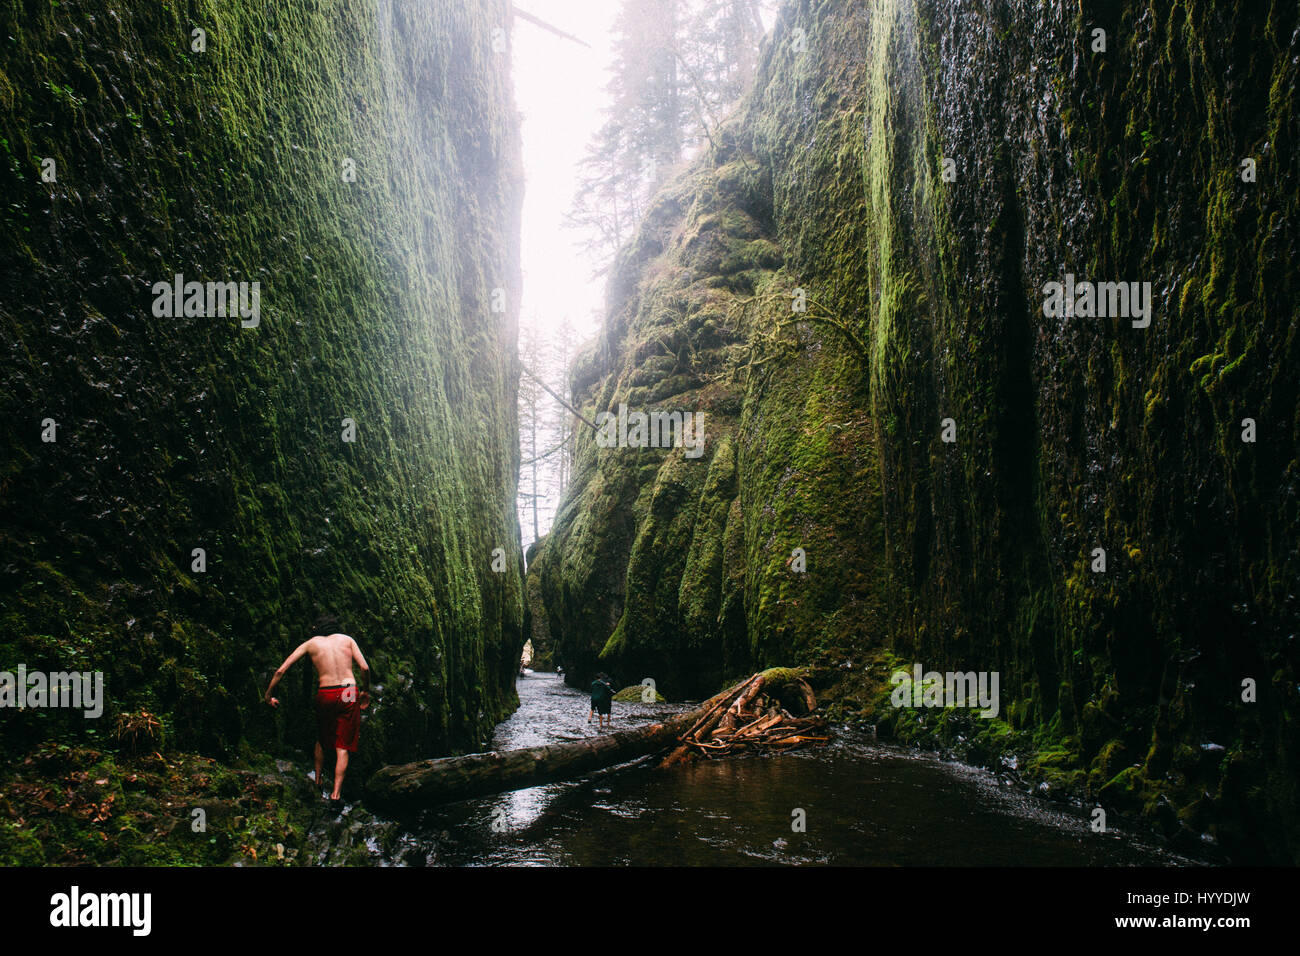 Oneonta Gorge, Pacific Northwest, Oregon - Stock Image